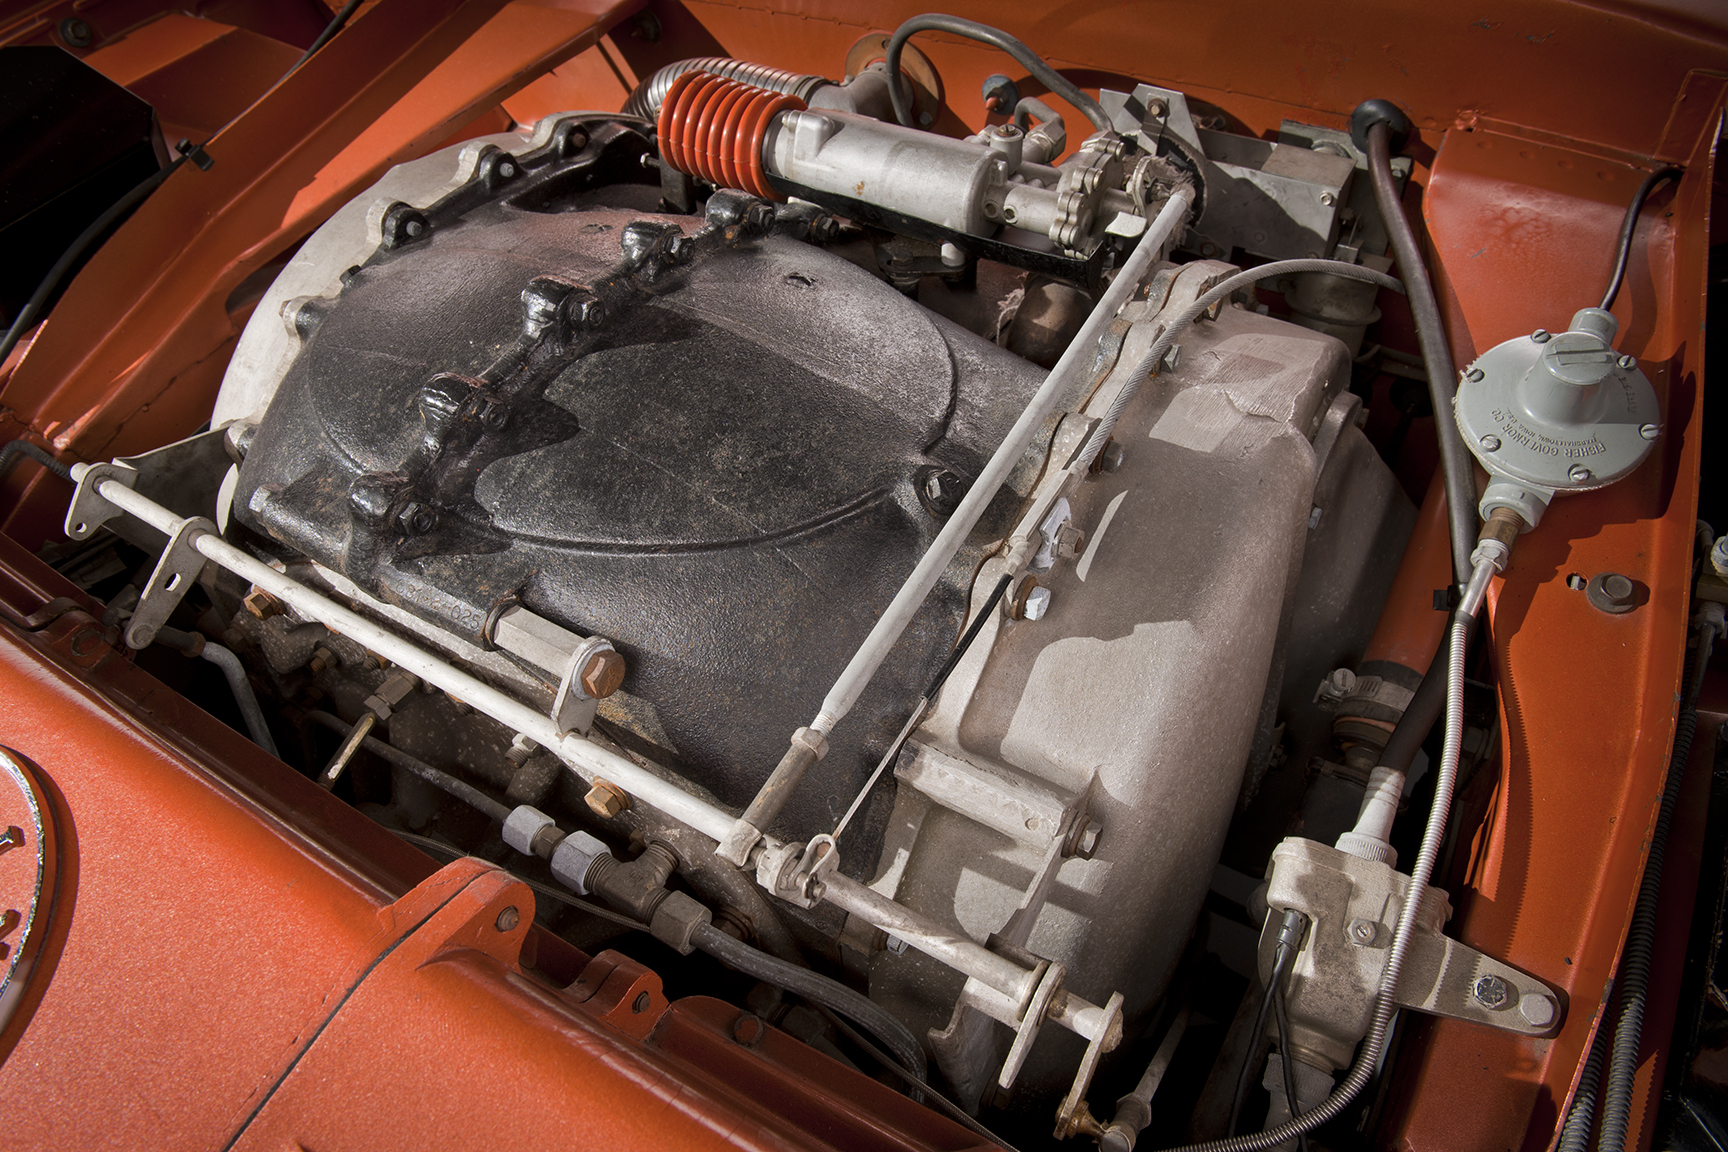 1964 Chrysler Turbine engine